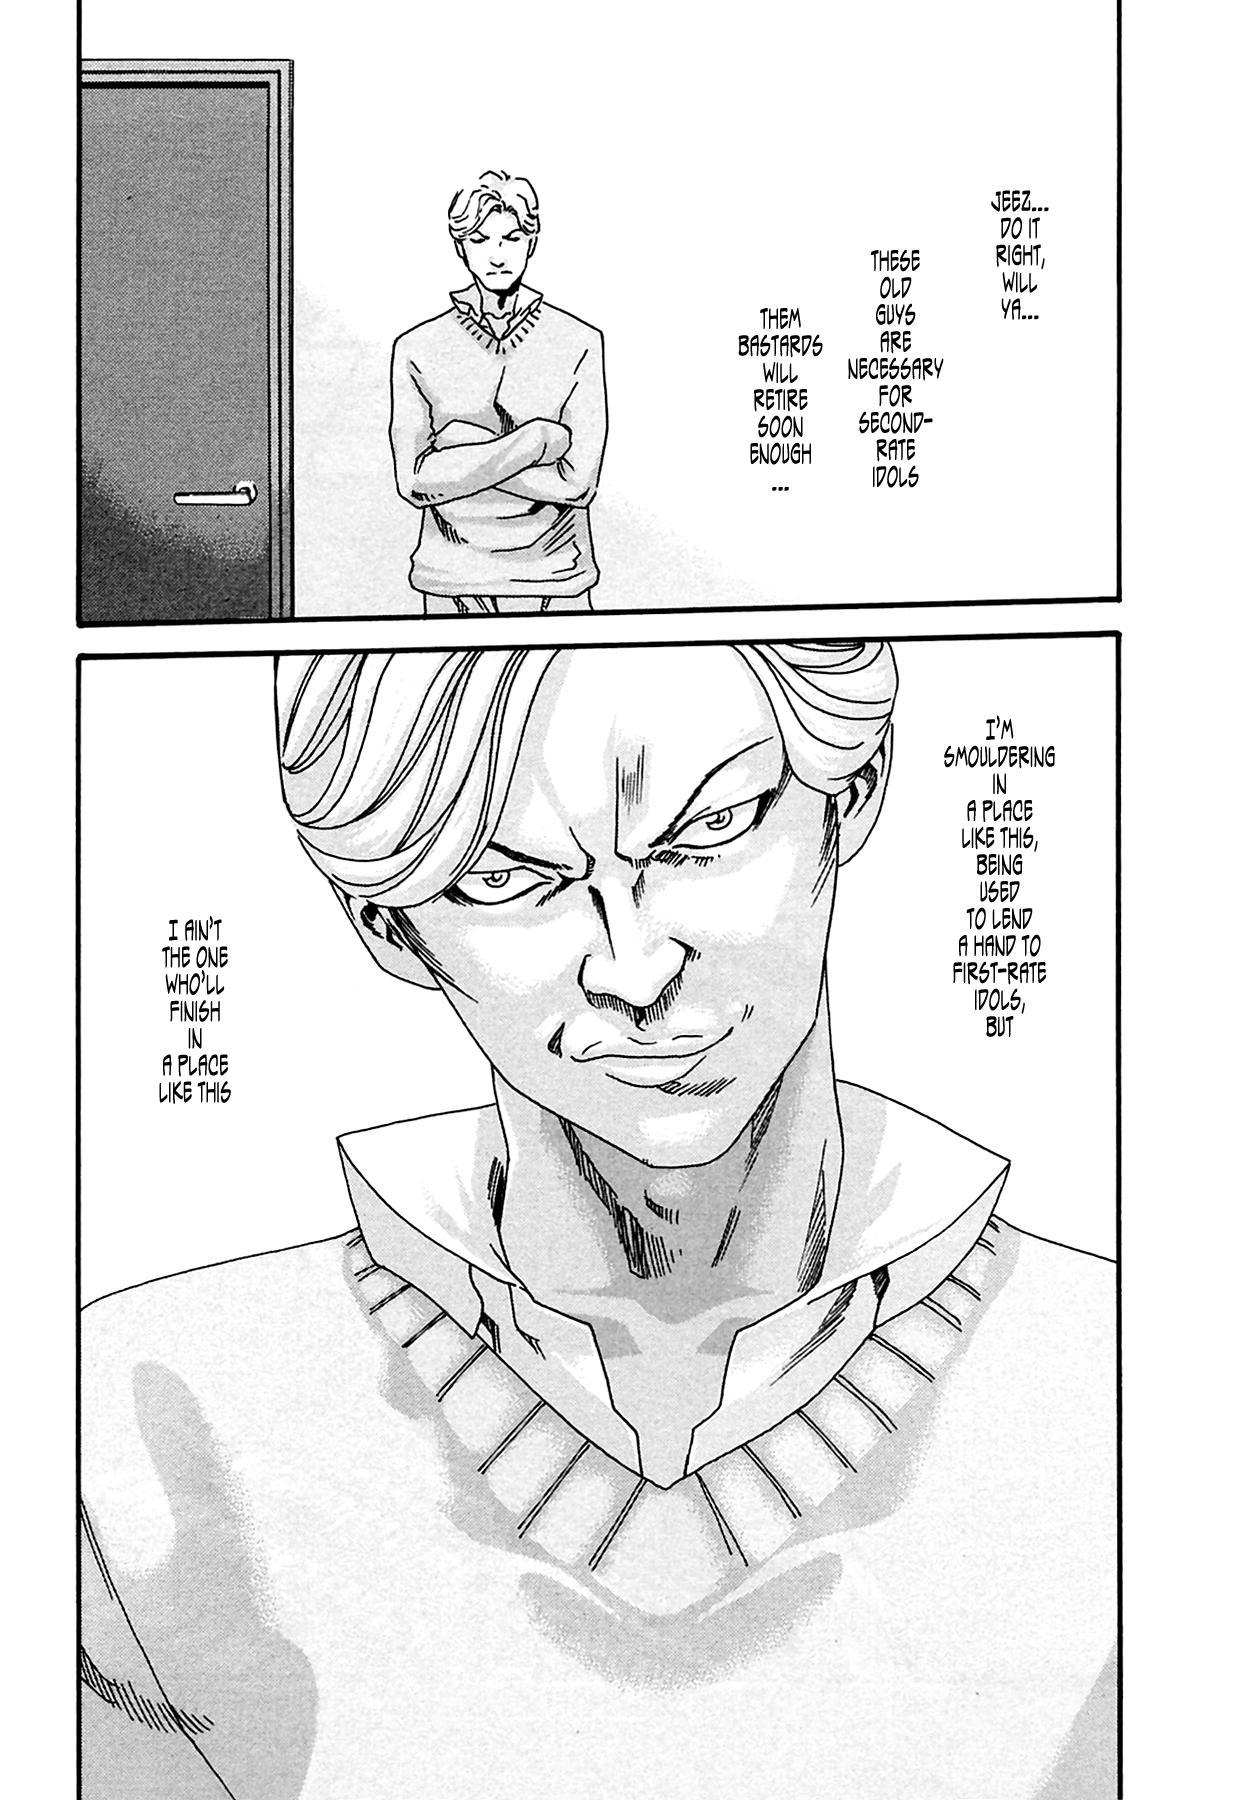 [Haruki] Kisei Juui Suzune (Parasite Doctor Suzune) Vol.02 - CH10-11 10